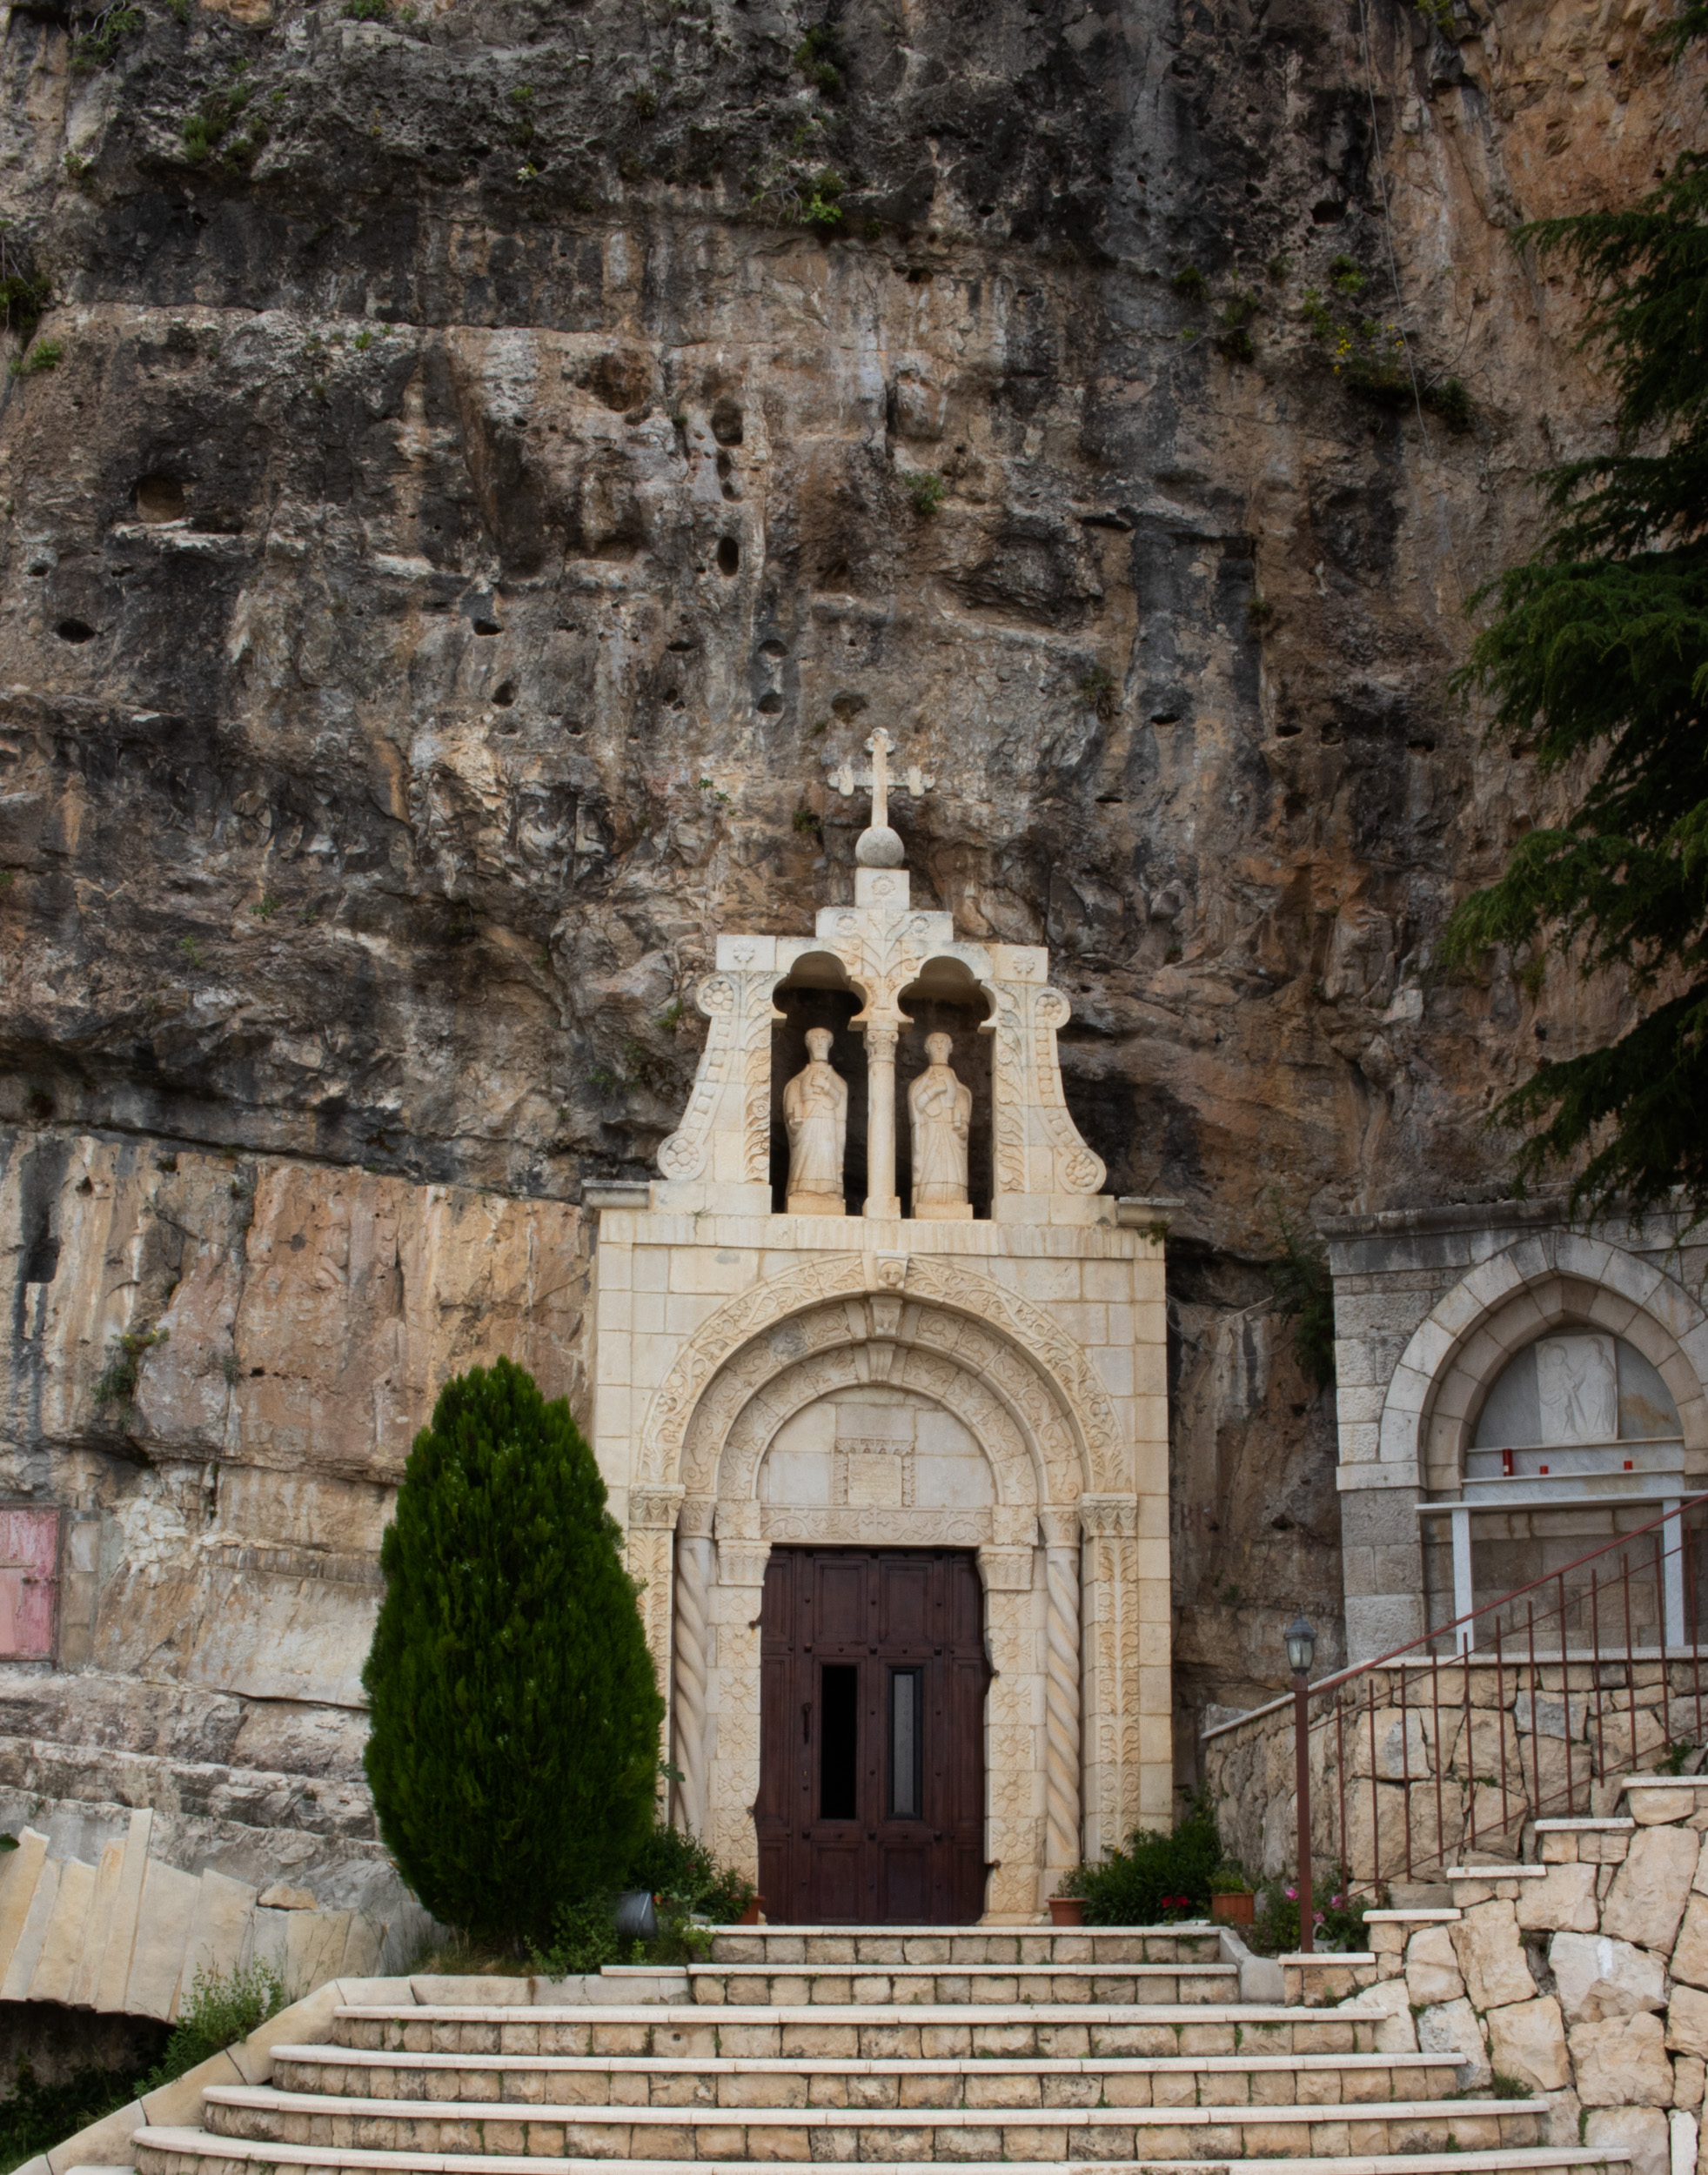 Peter and Paul Church, circa 400AD